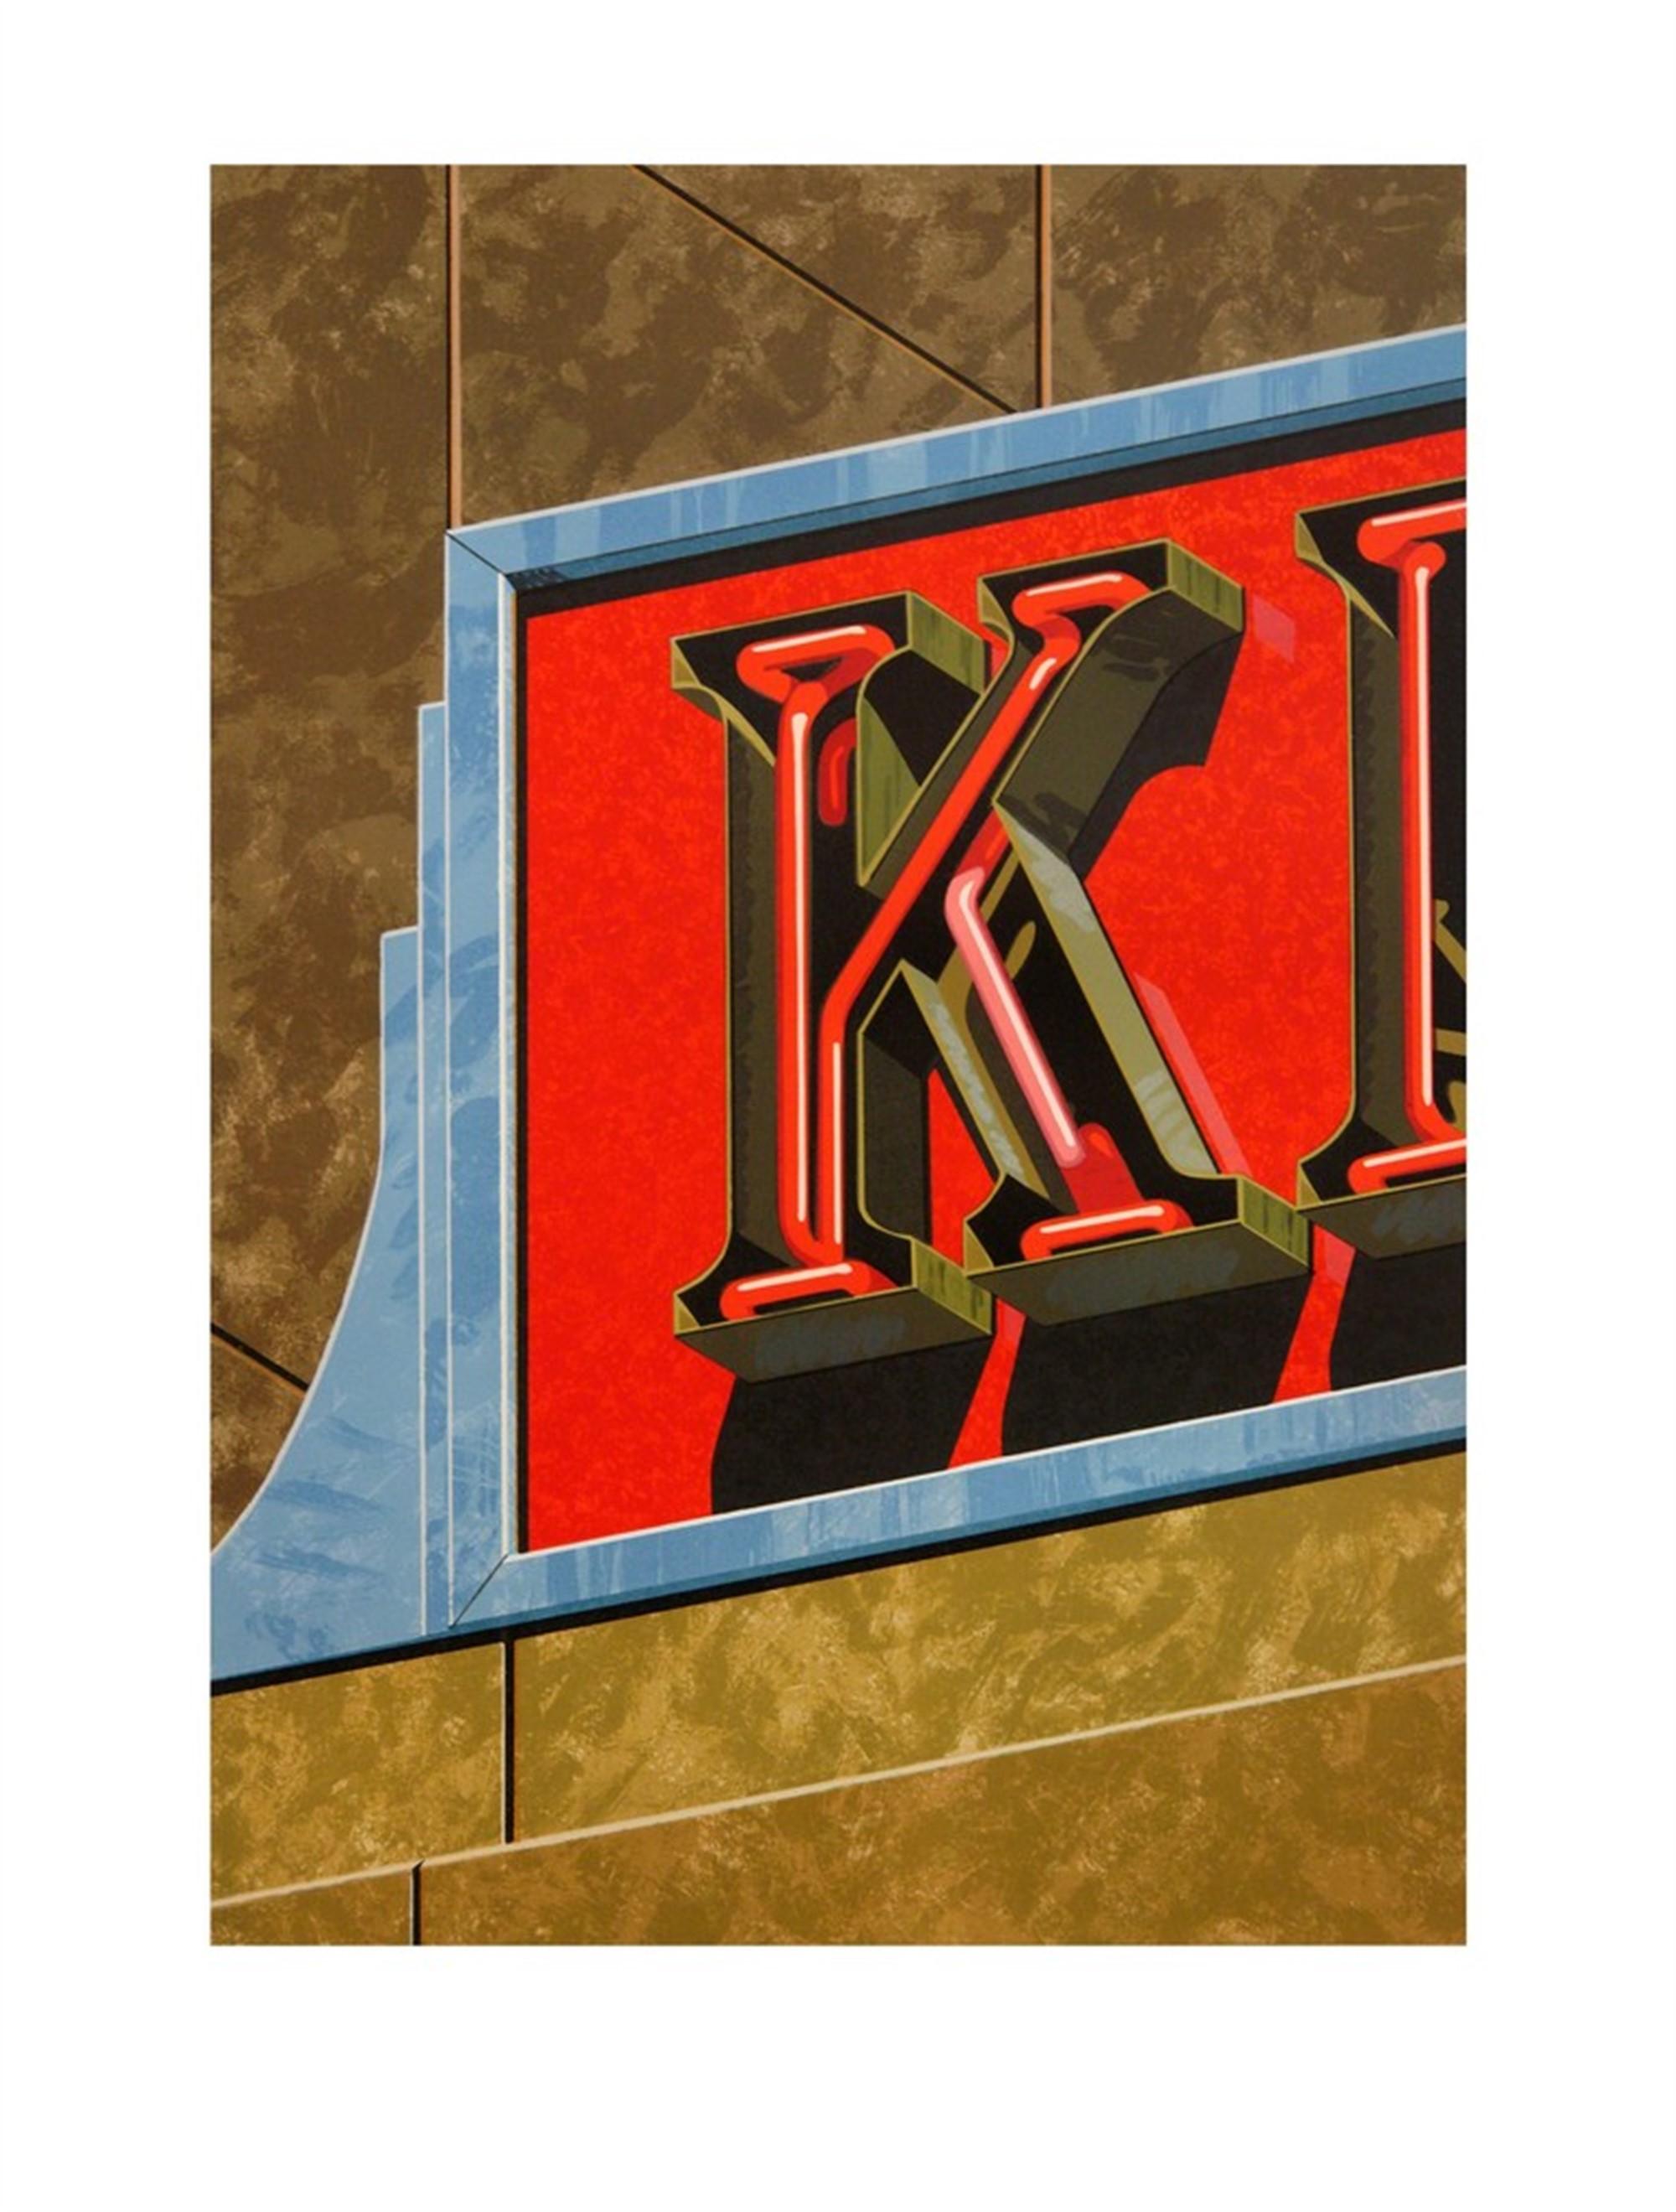 An American Alphabet: K by Robert Cottingham